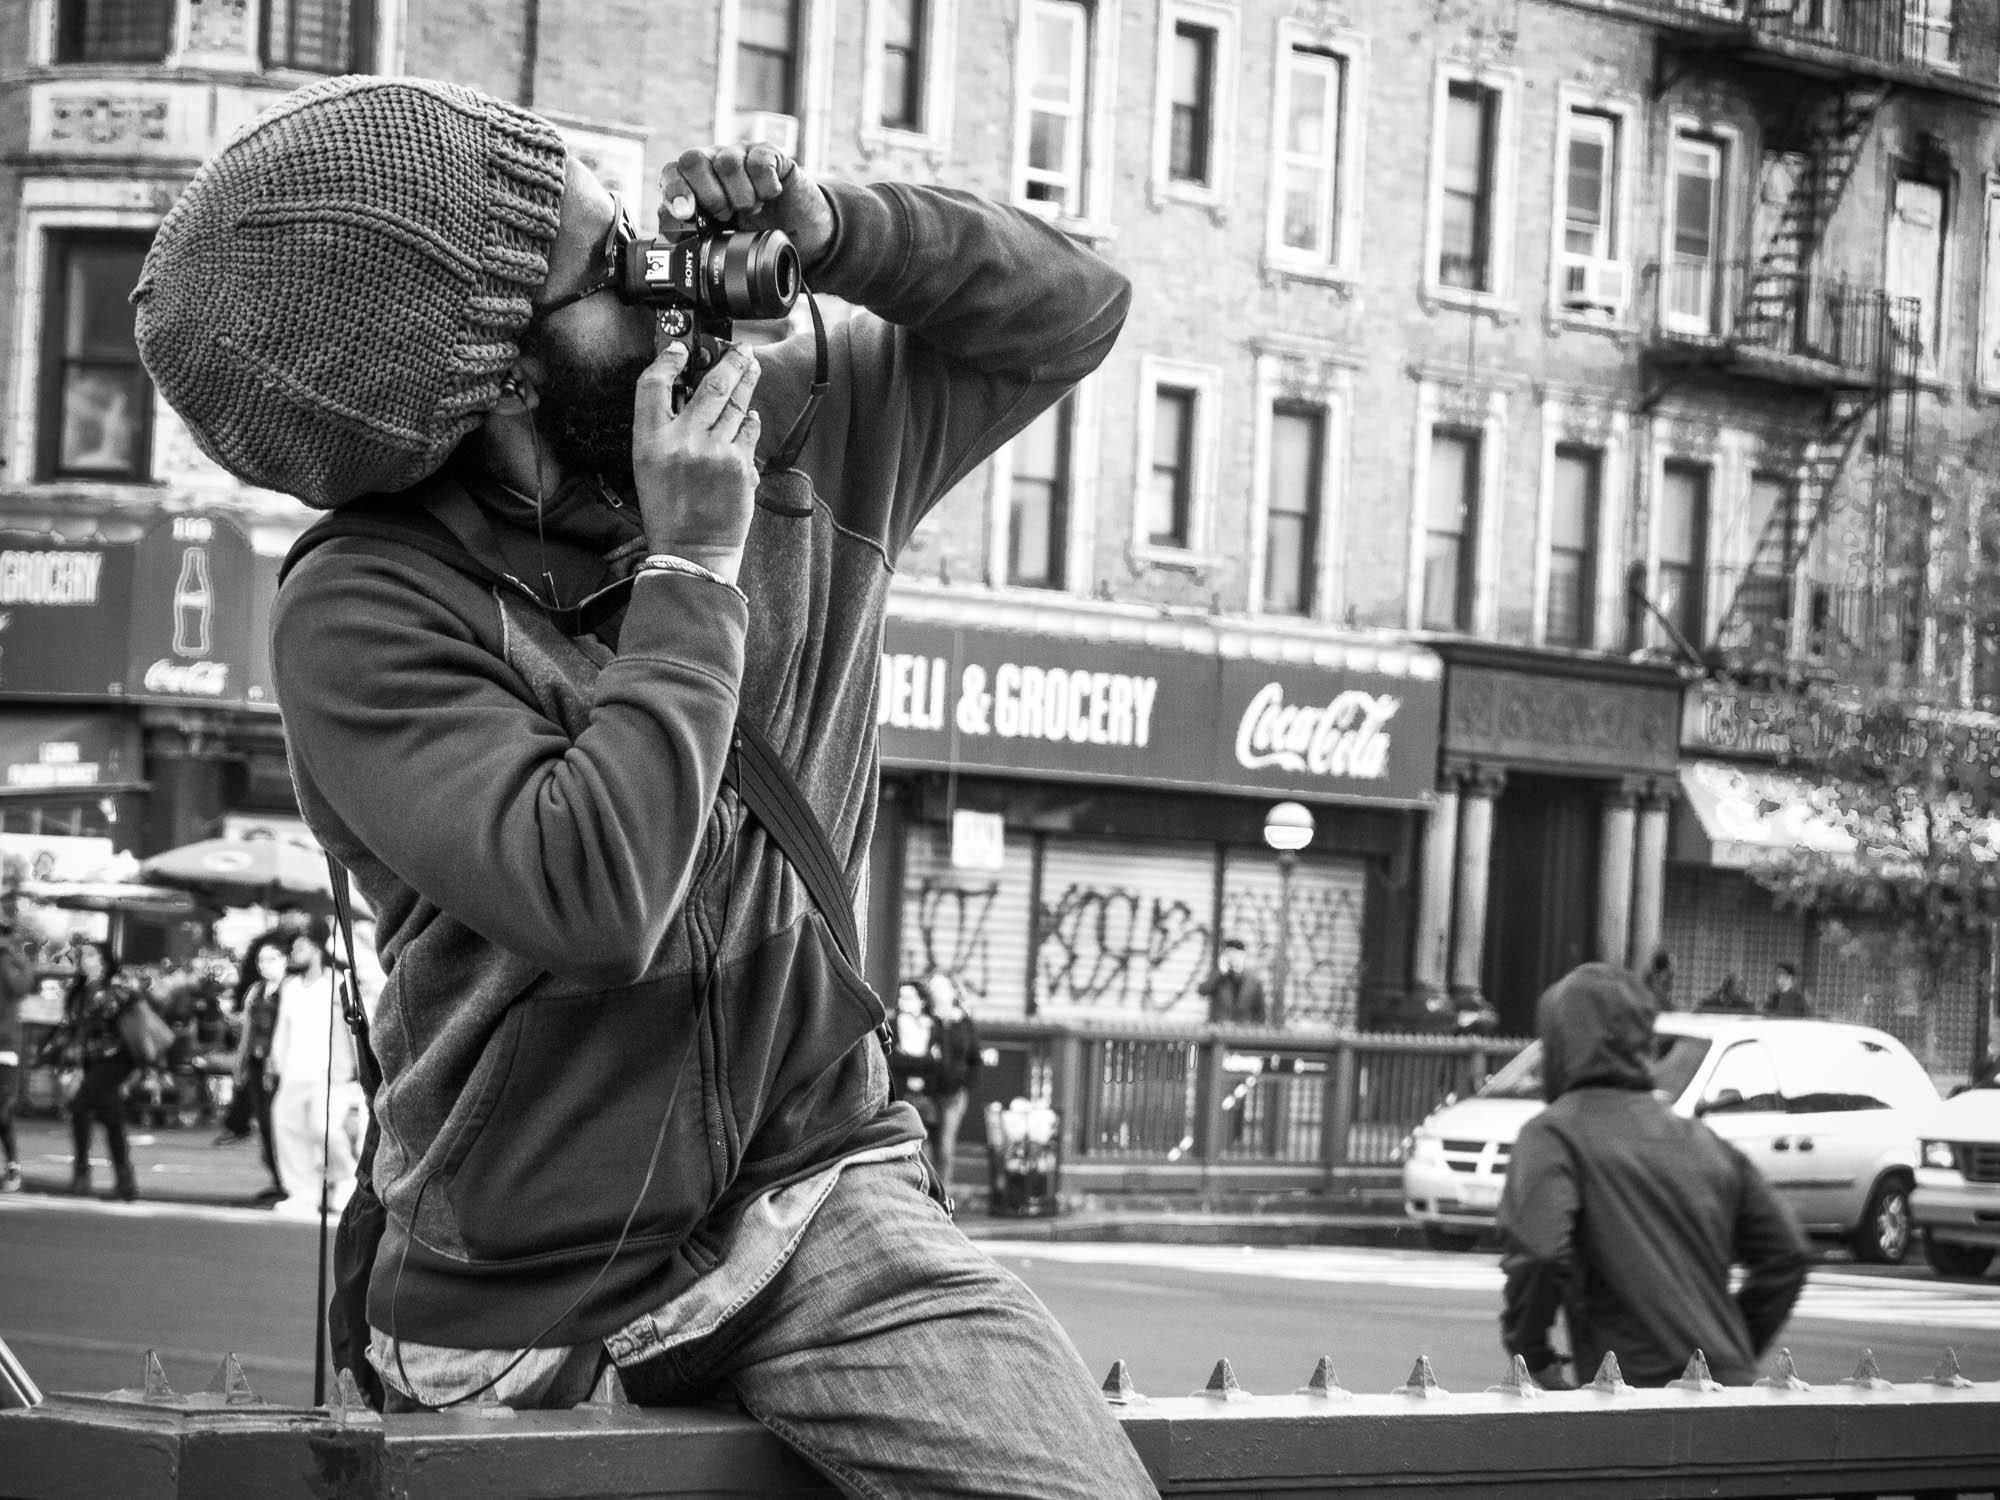 A photographer in Harlem, New York, USA